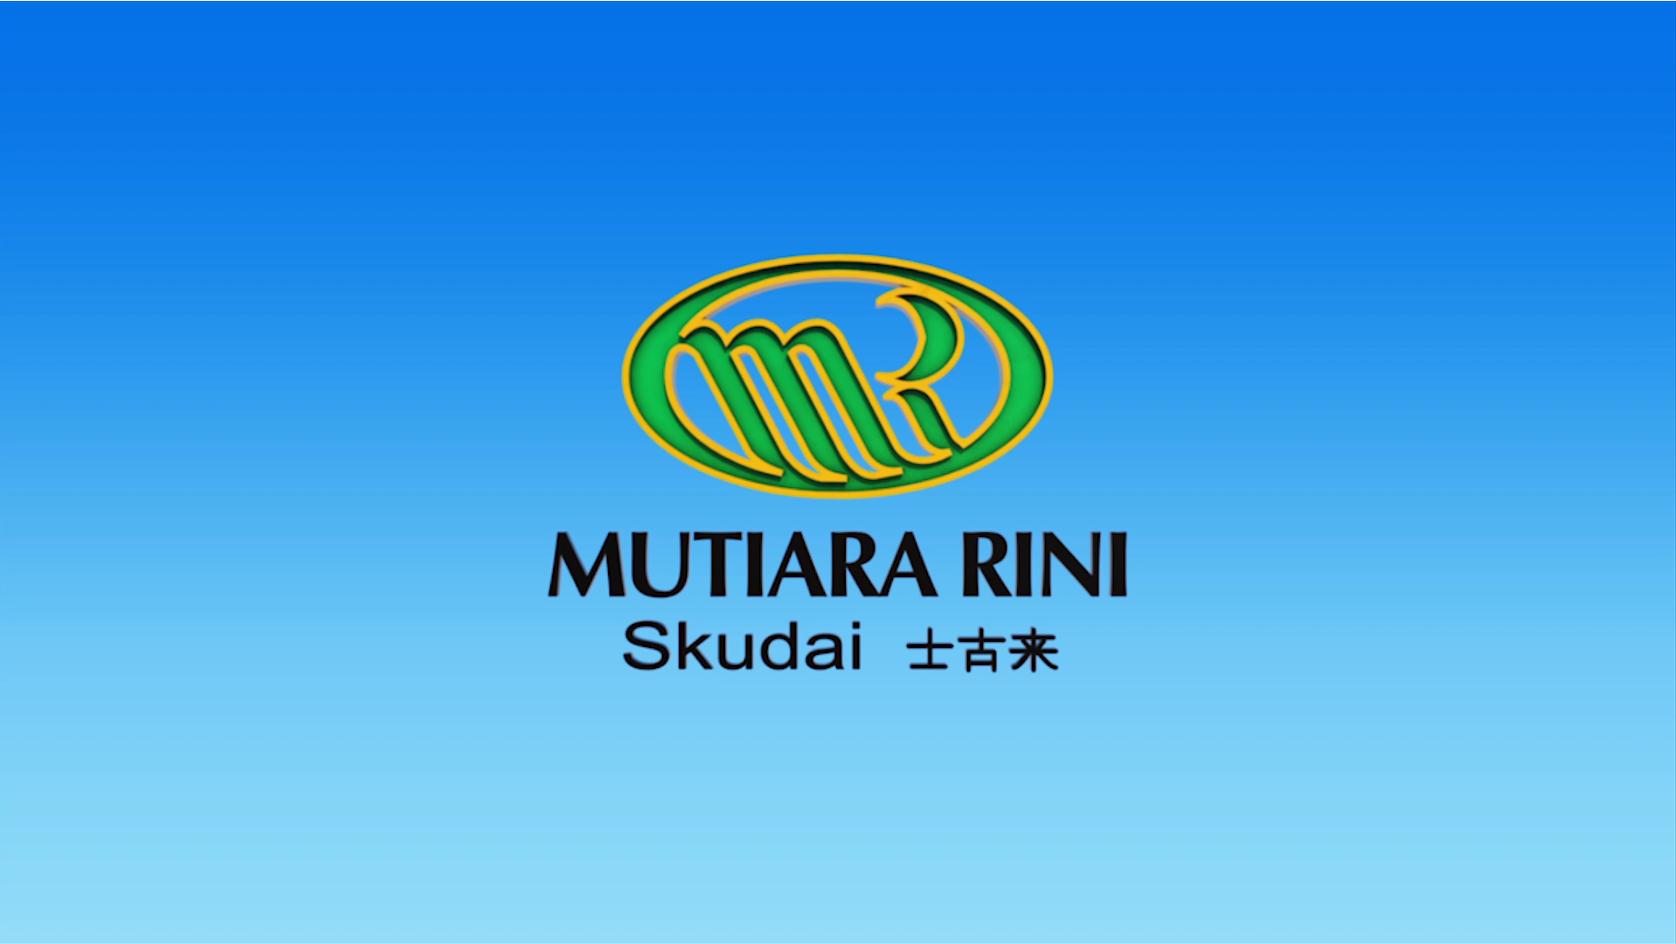 Mutiara Rini Skudai Corporate Video